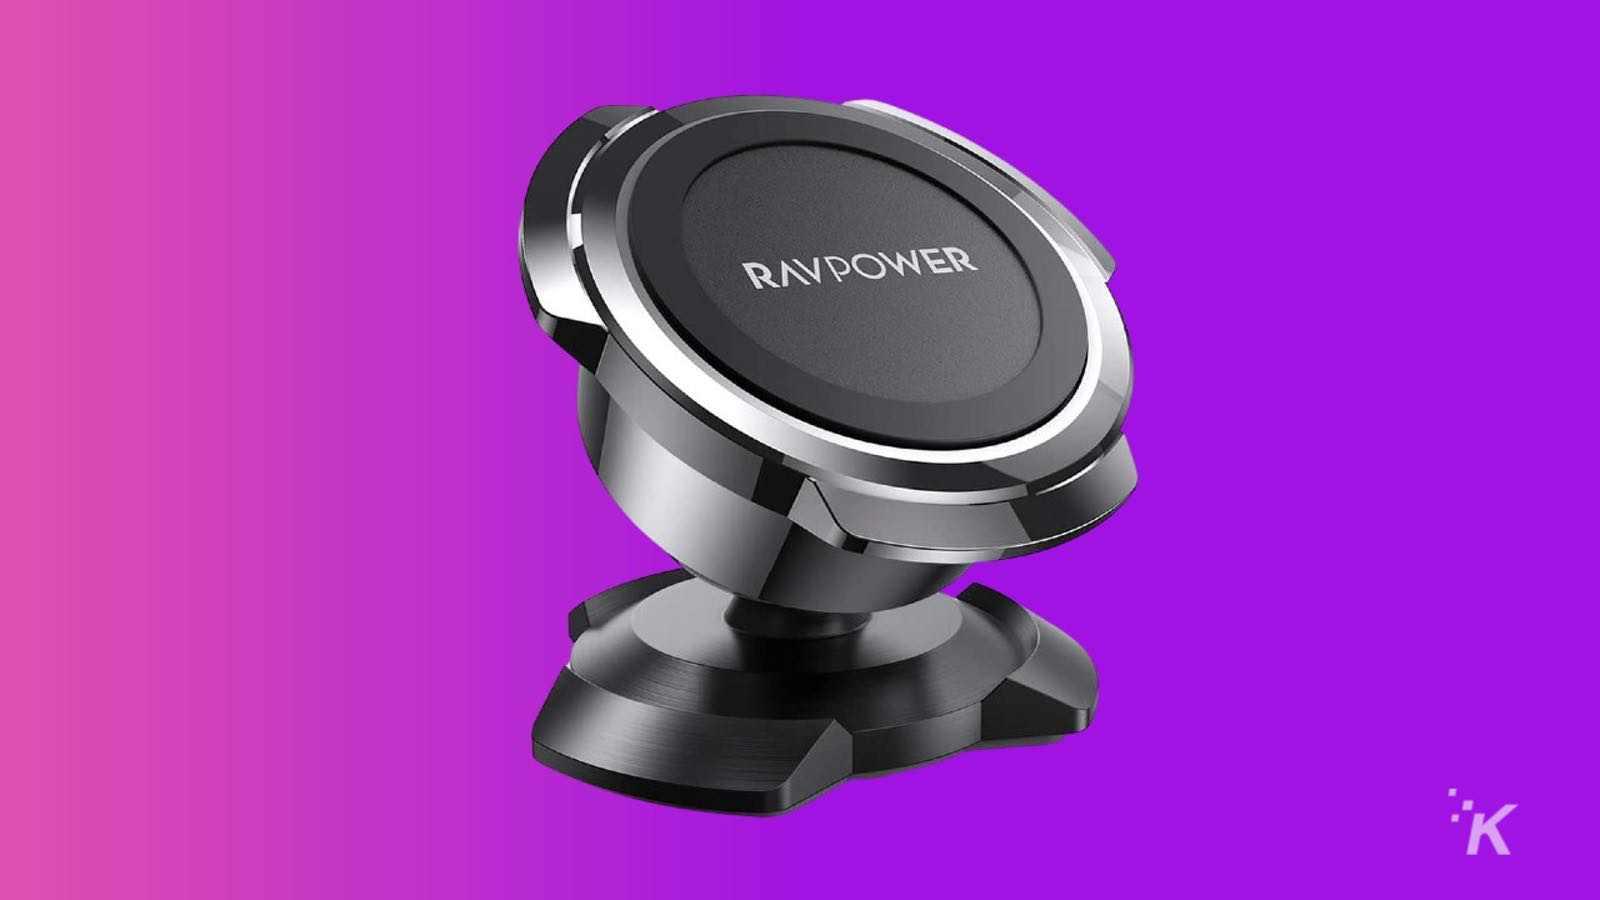 ravpower magnetic car mount